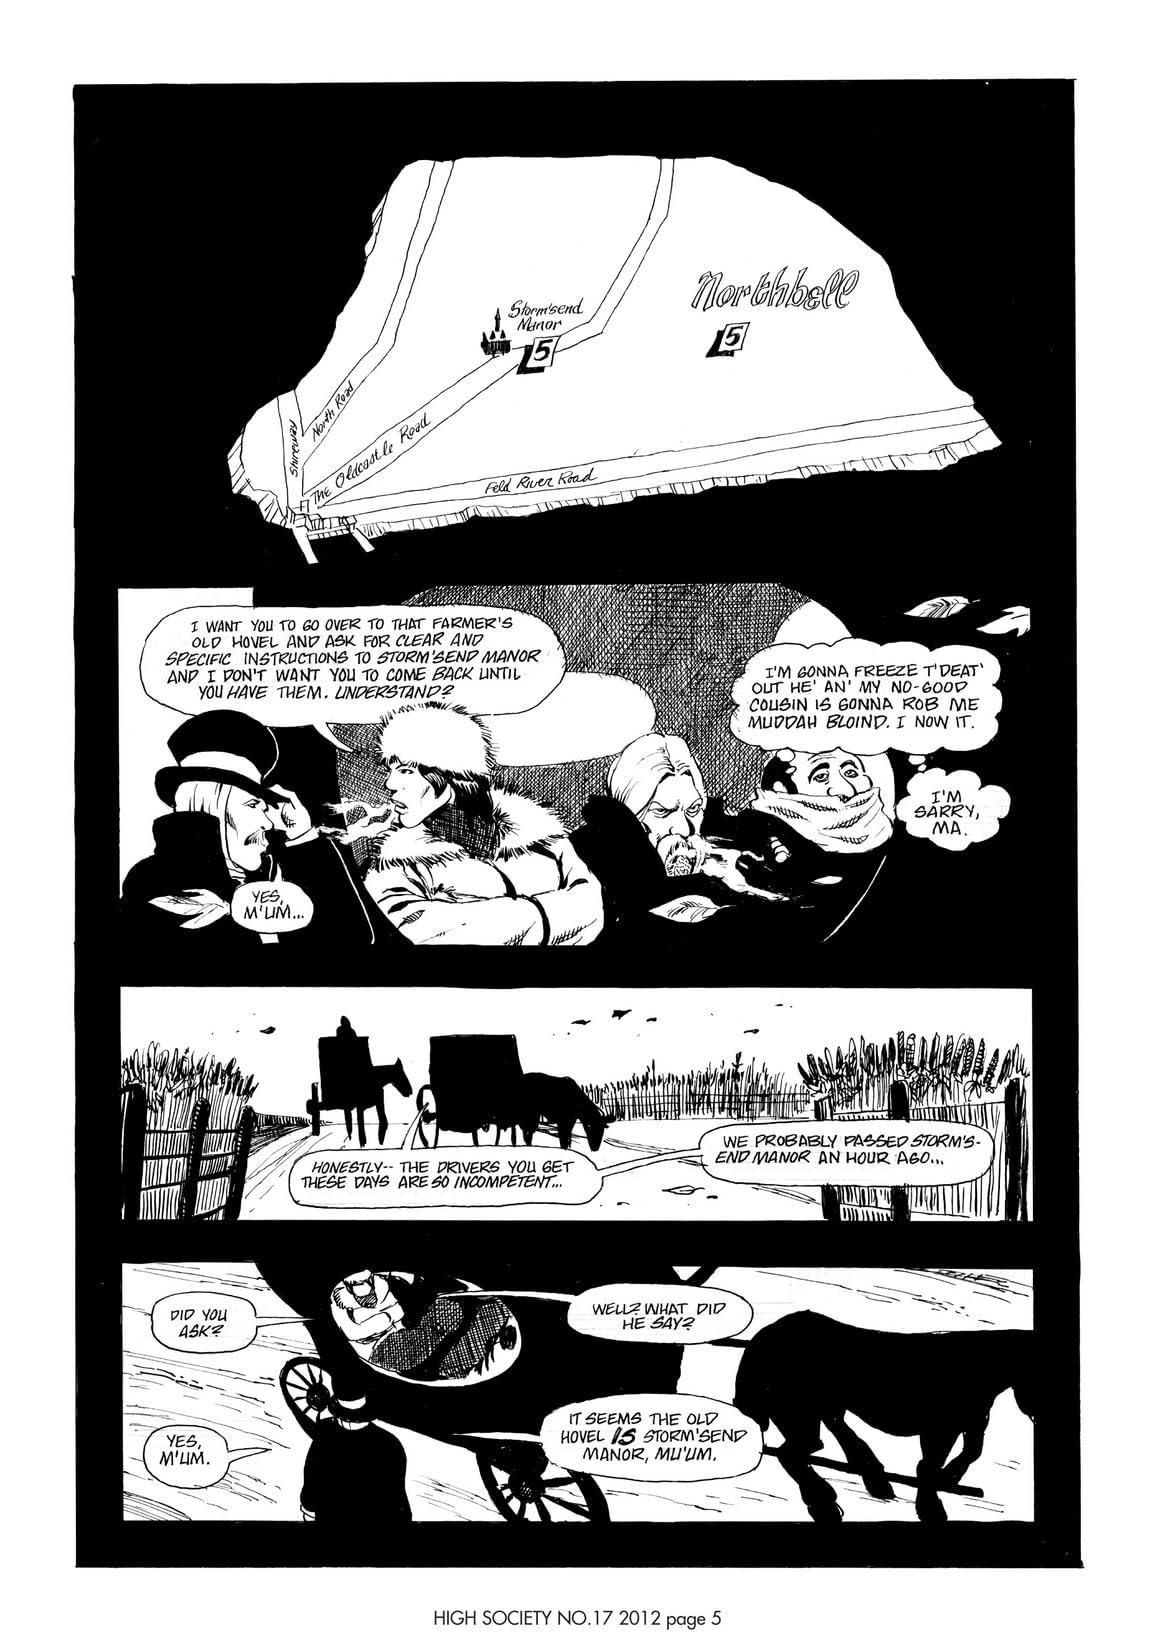 Cerebus Vol. 2 #17: High Society